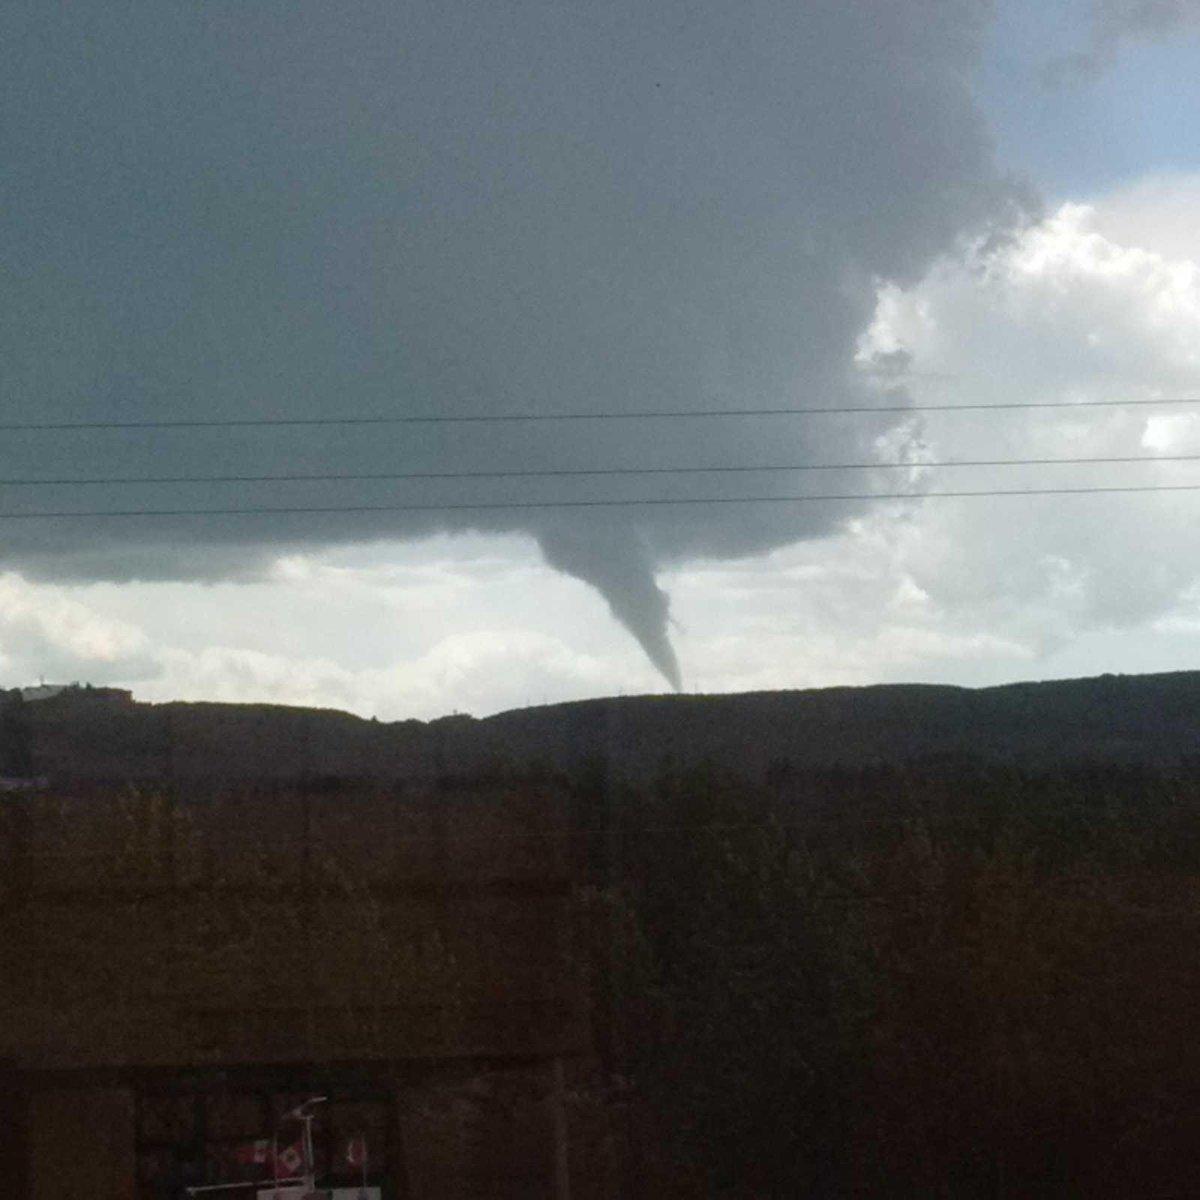 View from my wife's office in in NW Calgary. #abstorm http://t.co/ji9VMGDzSz